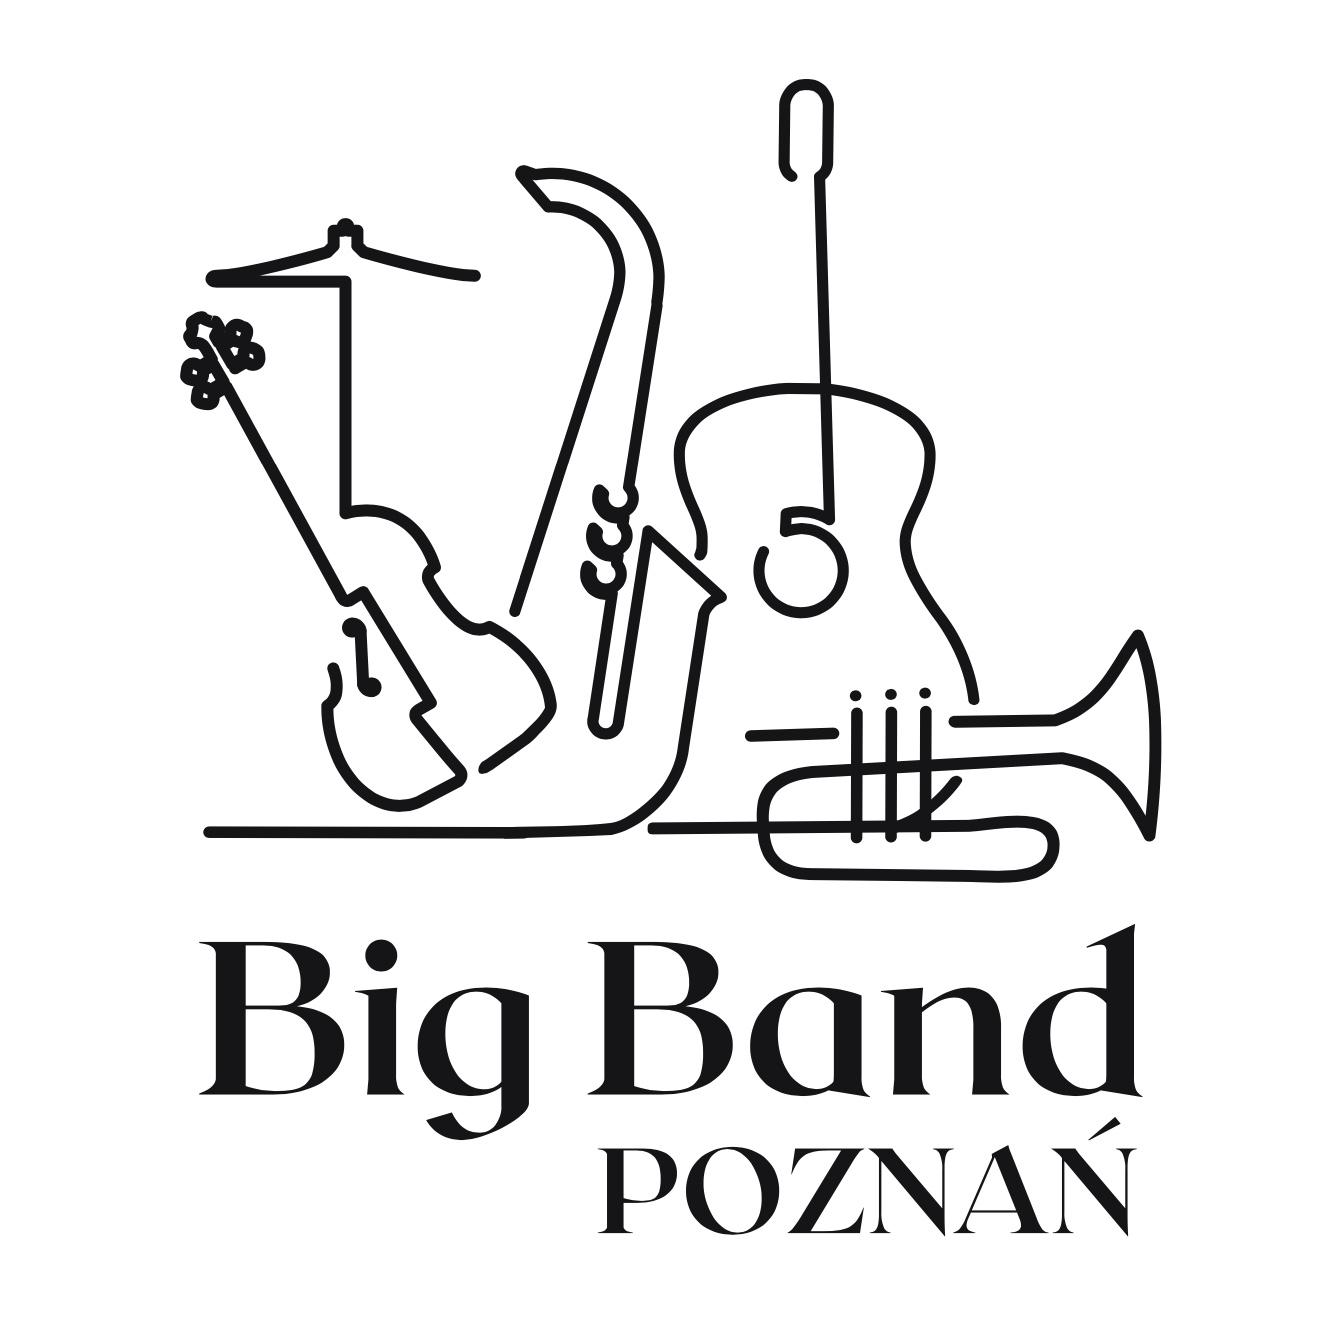 Big Band Poznań